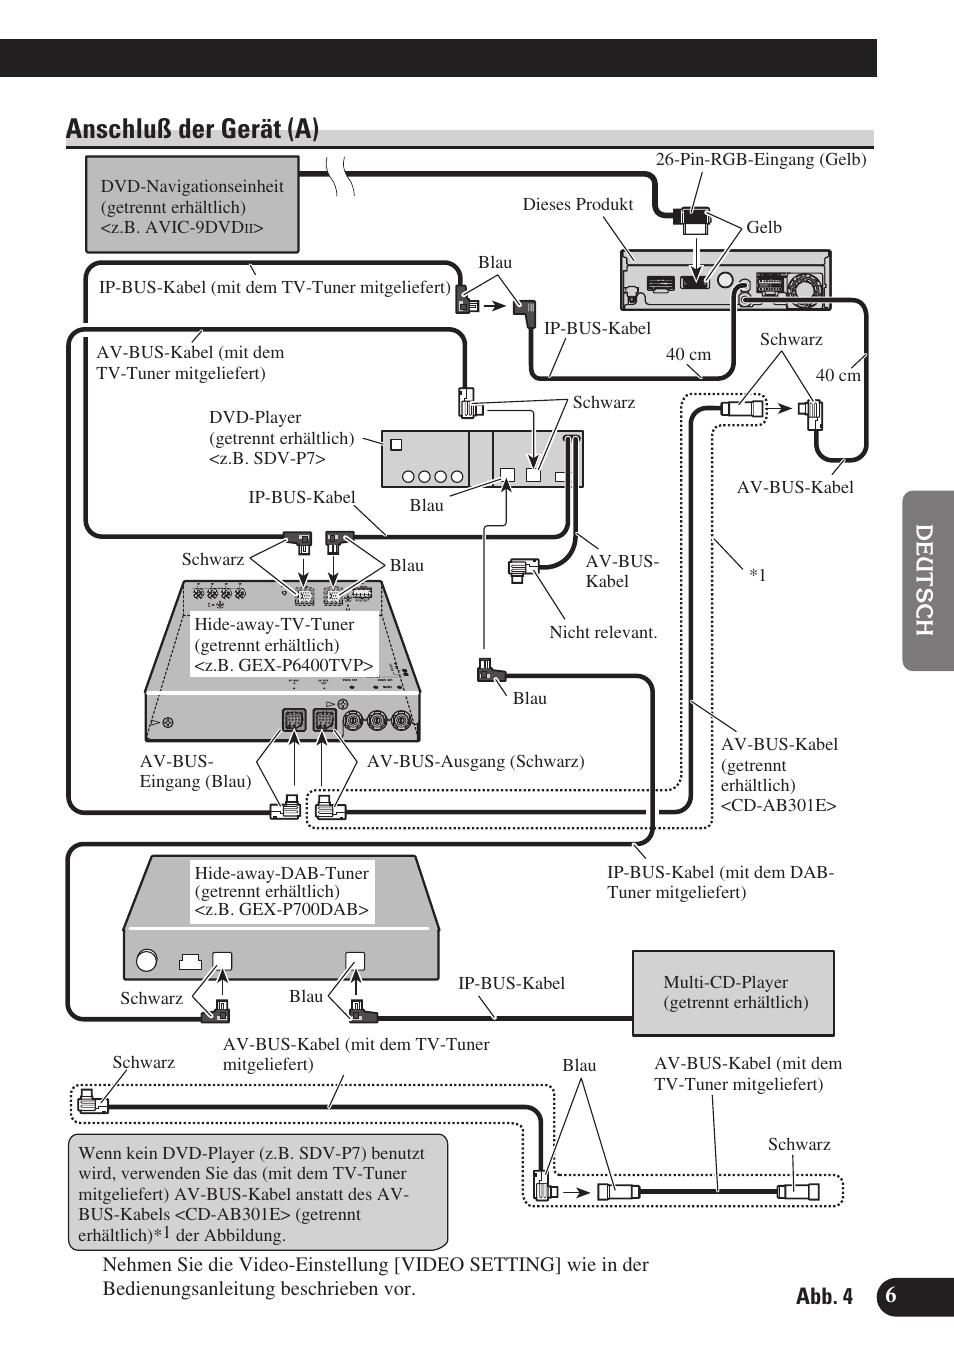 Anschluß der gerät (a) | Pioneer AVH-P6400R User Manual | Page 31 / 76